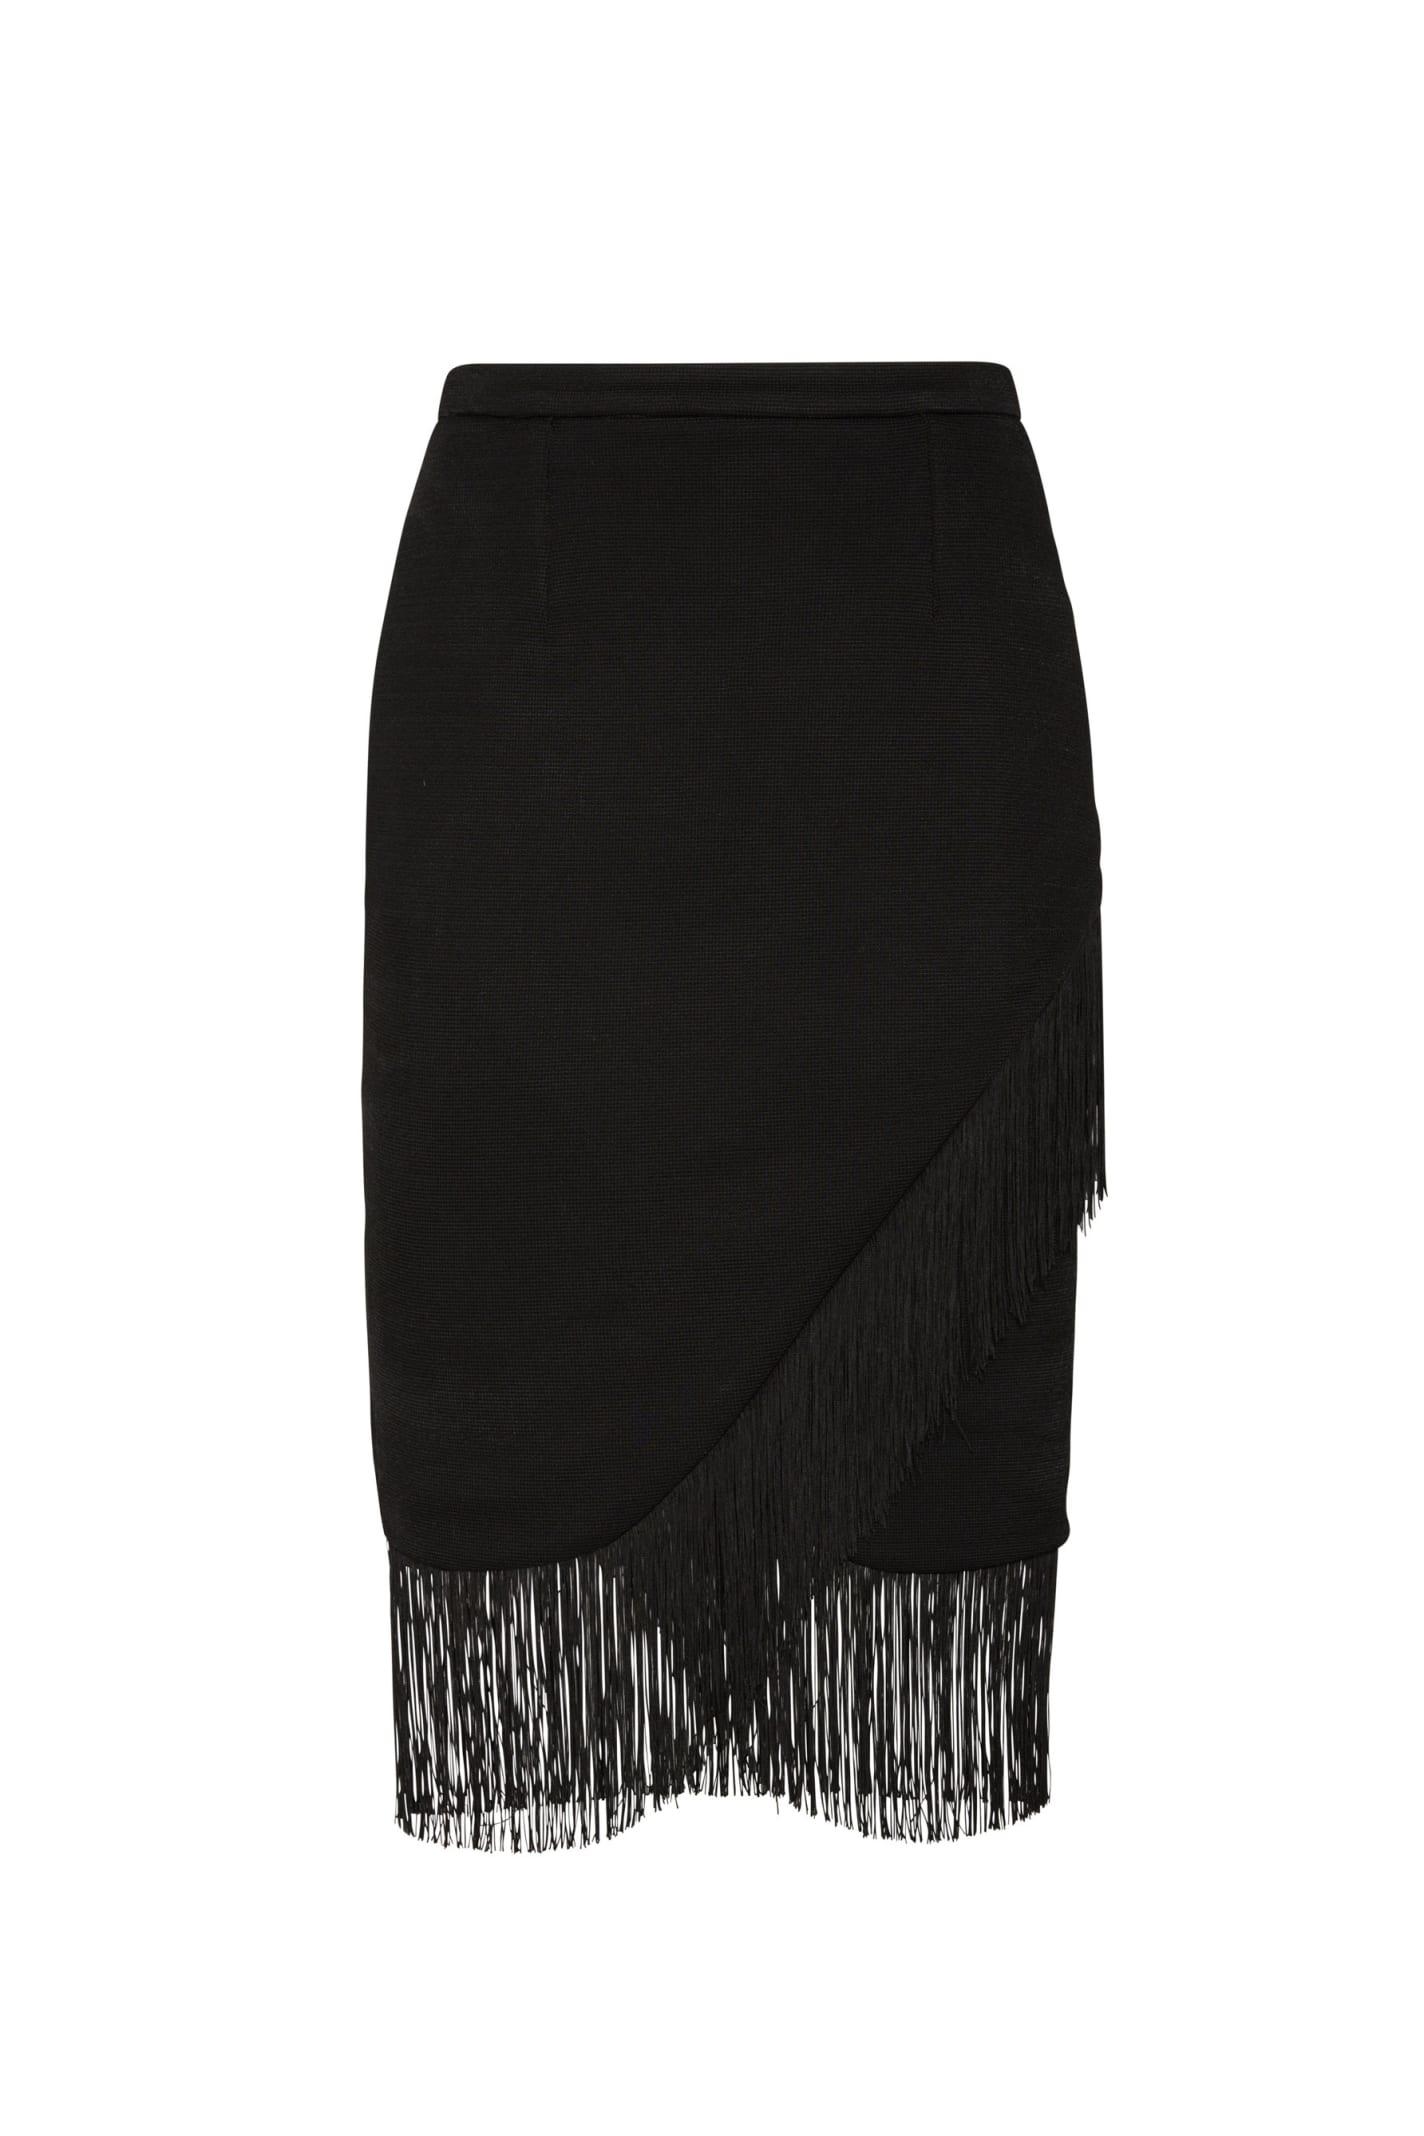 Lola Skirt In Black Jersey